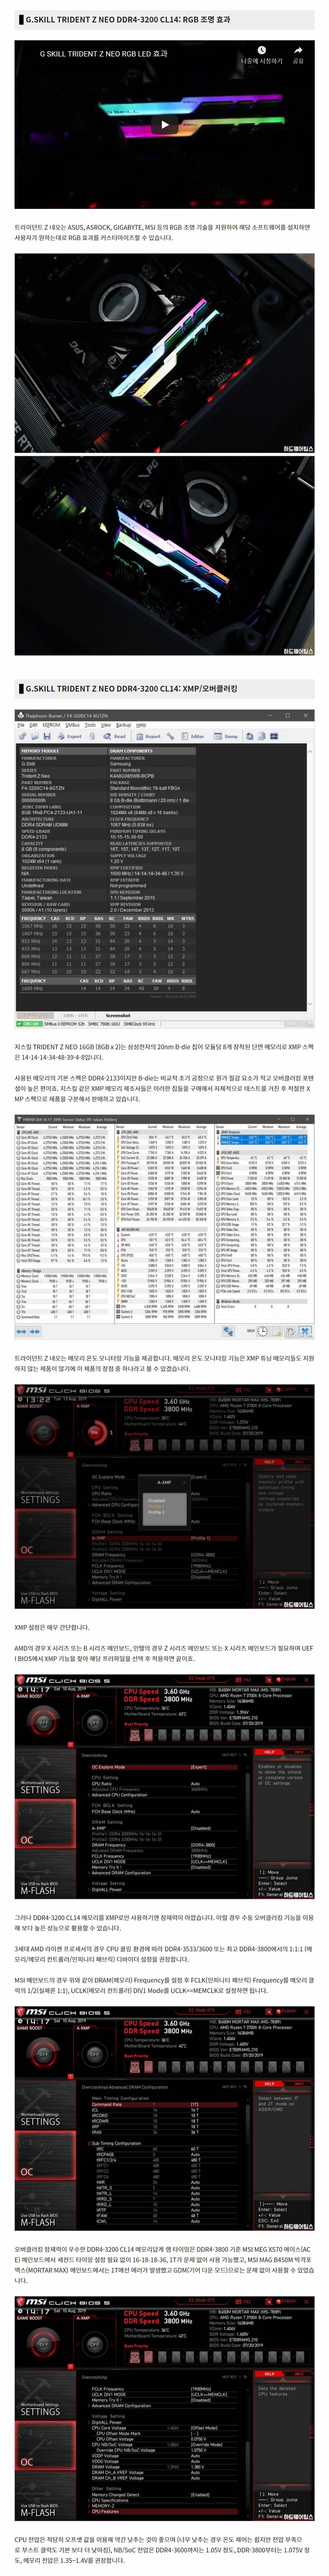 G.SKILL DDR4 16G PC4-25600 CL14 TRIDENT Z NEO (8Gx2) 리뷰 5.jpg